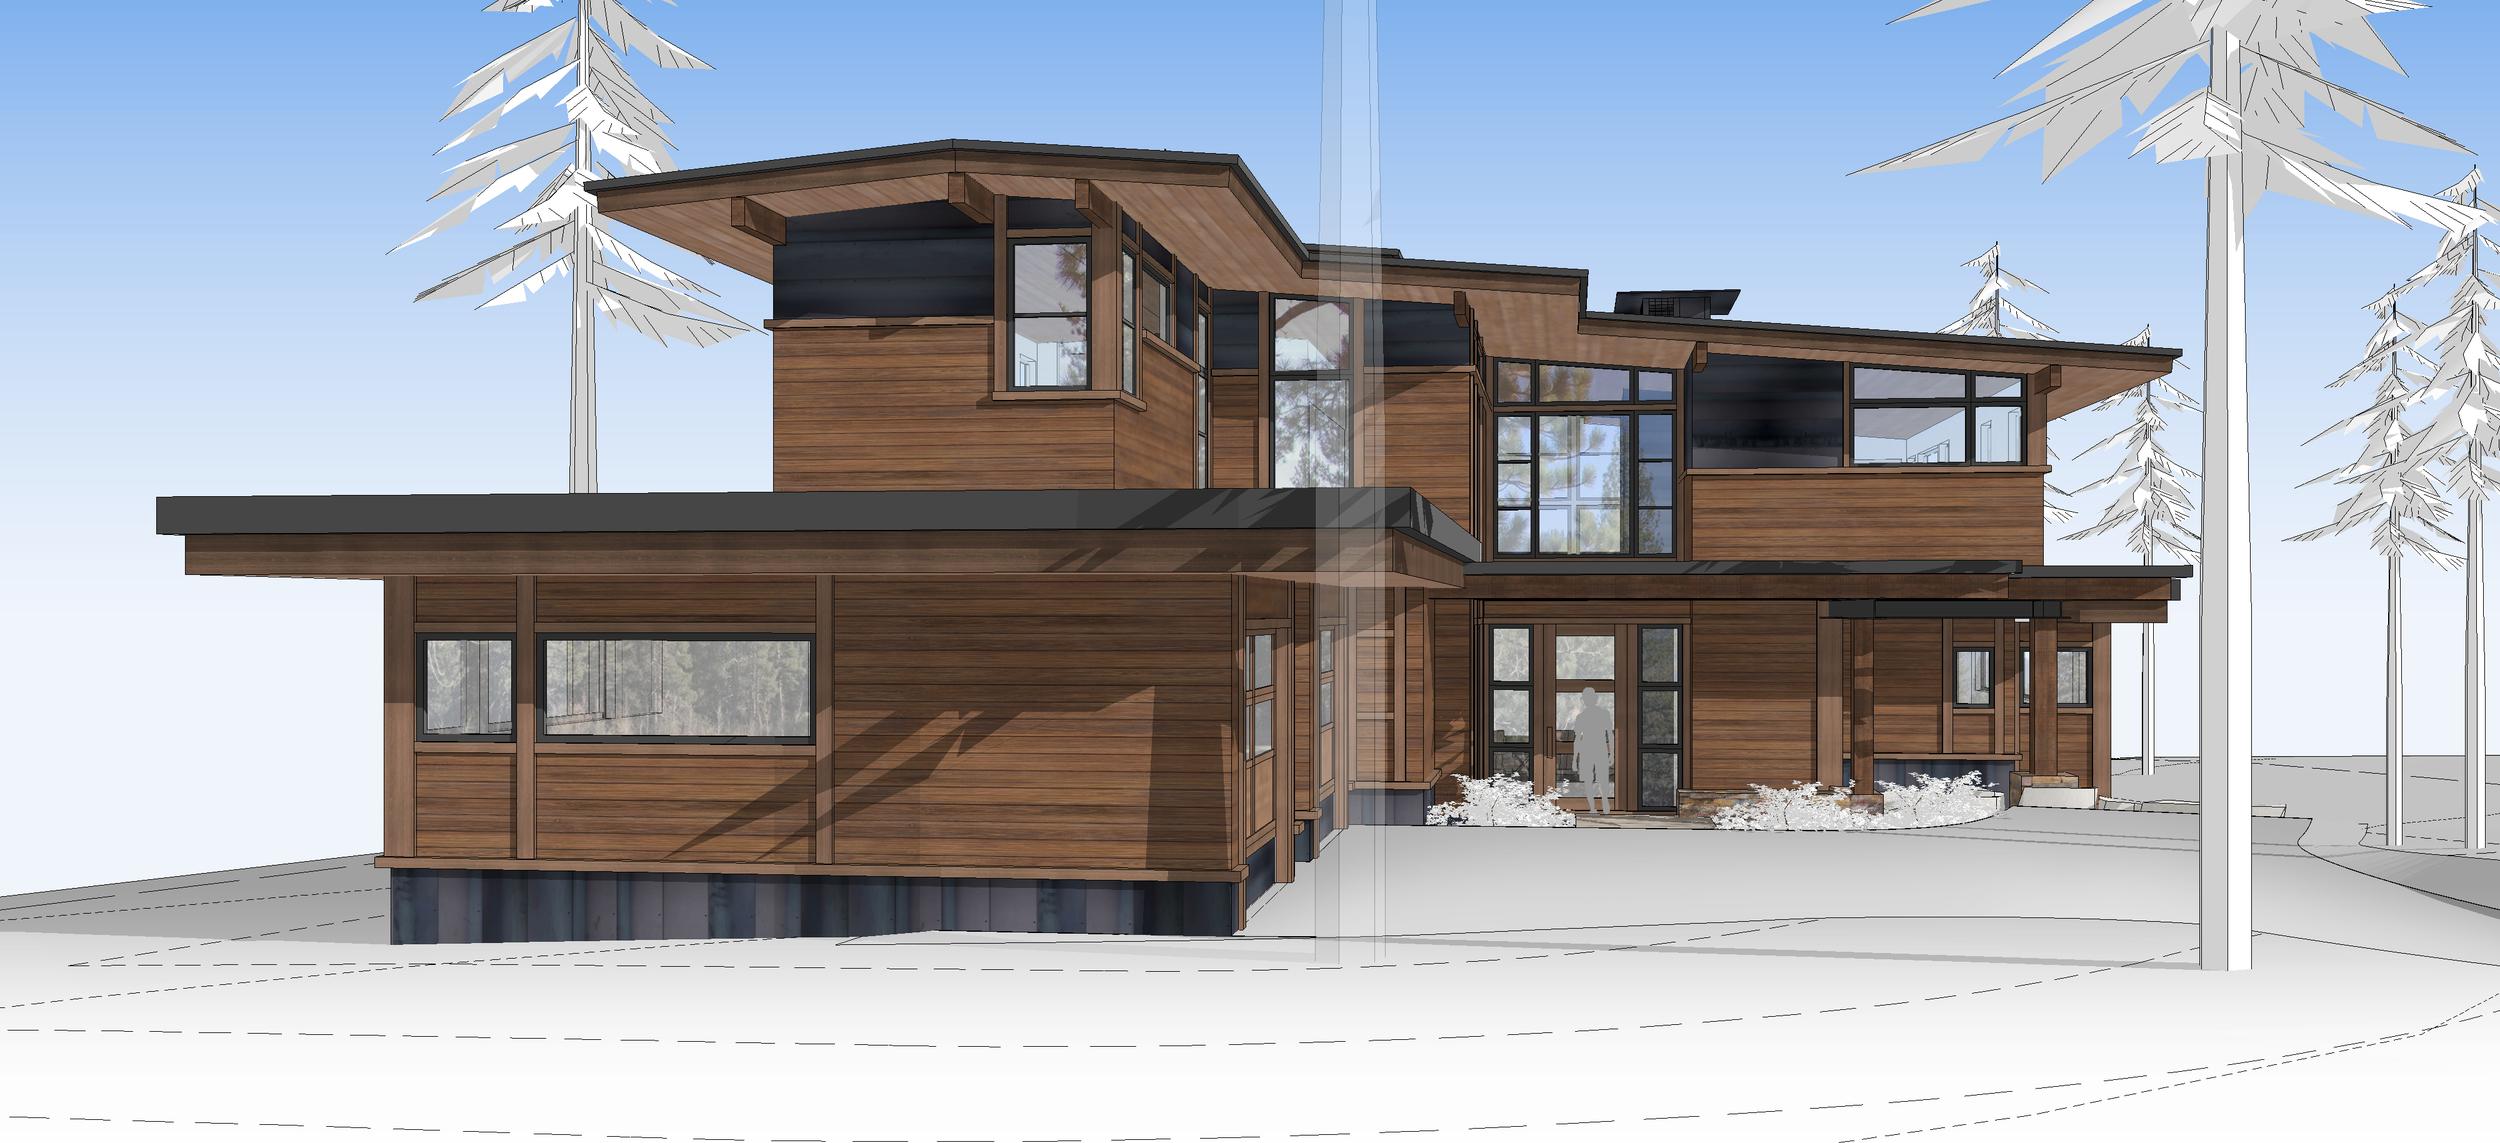 Contractor: Lamperti Construction   Square Footage: 3,250 sf bedrooms: 4 bathrooms: 4.5